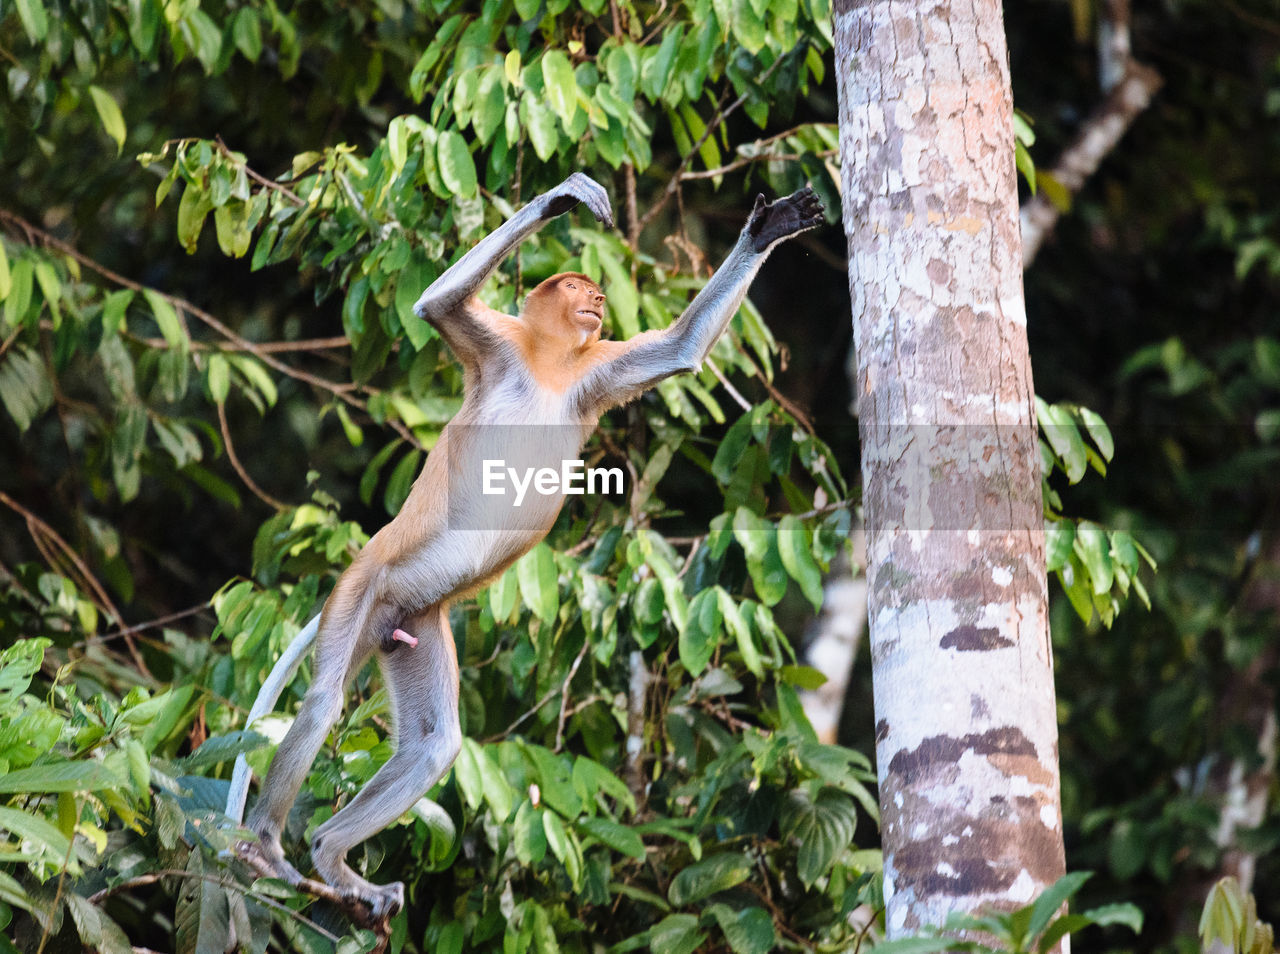 Monkey jumping on tree